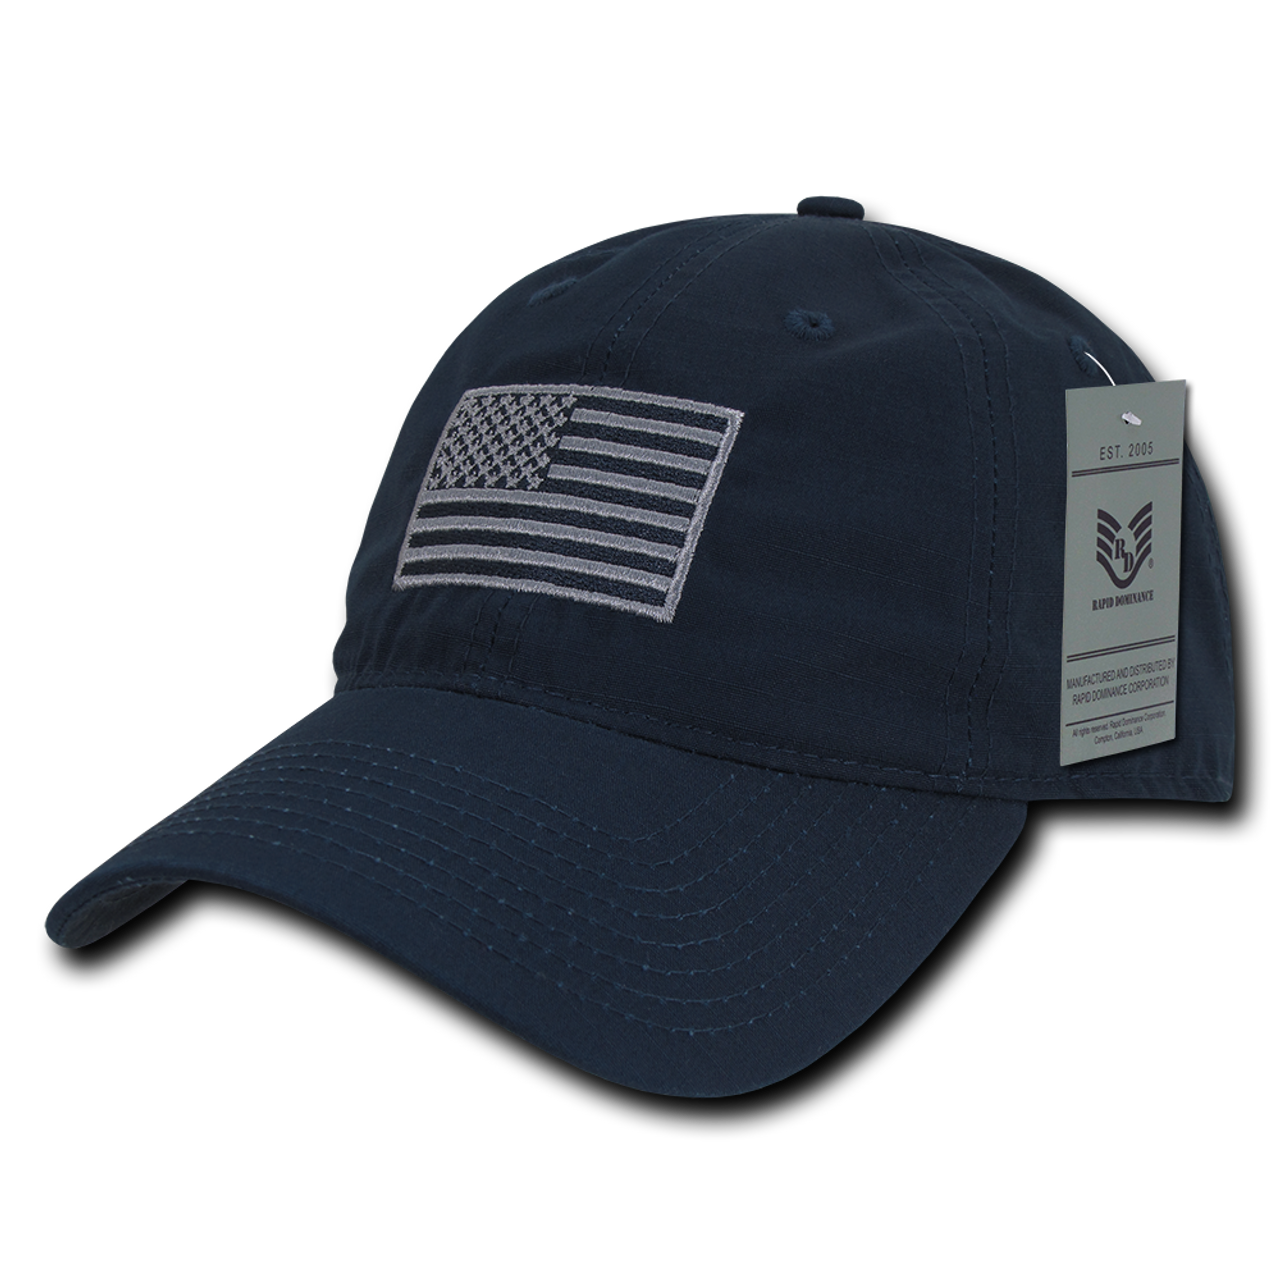 933a700014d61 S73 - USA Flag Cap - Relaxed Ripstop - Cotton - Dark Blue -  USMILITARYHATS.COM